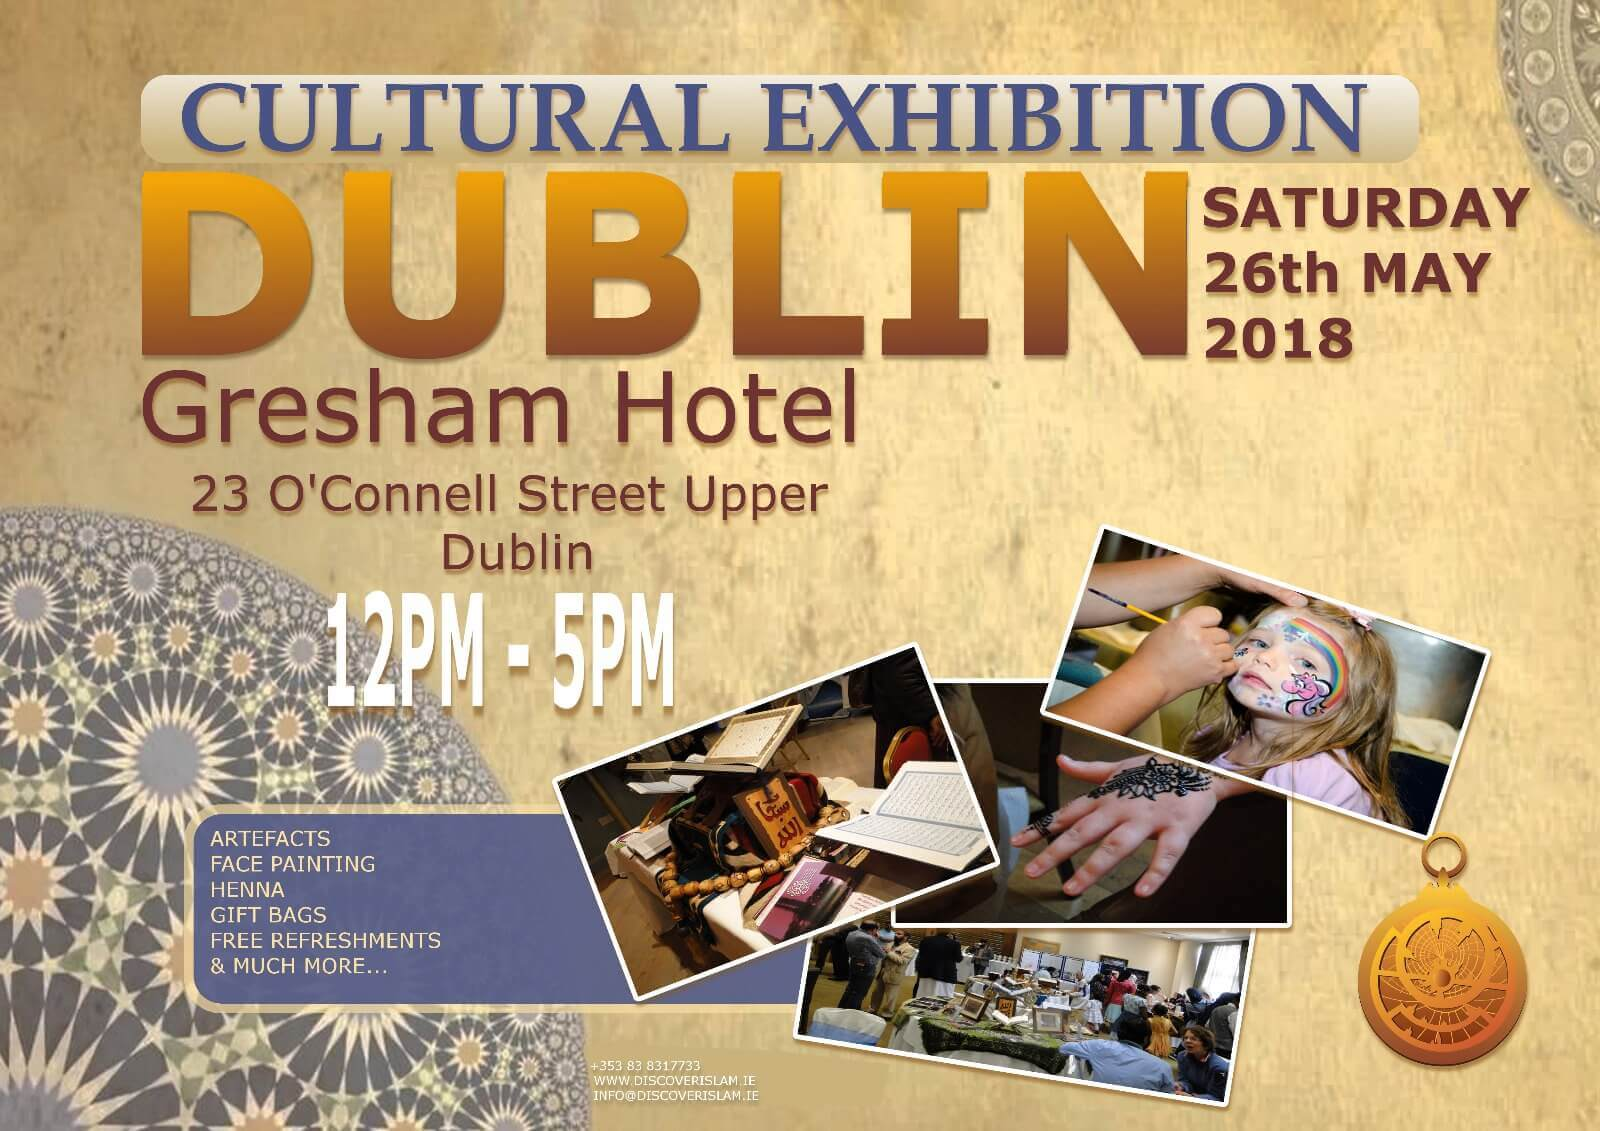 DUBLIN ISLAMIC CULTURE EXHIBITION 2018 Image